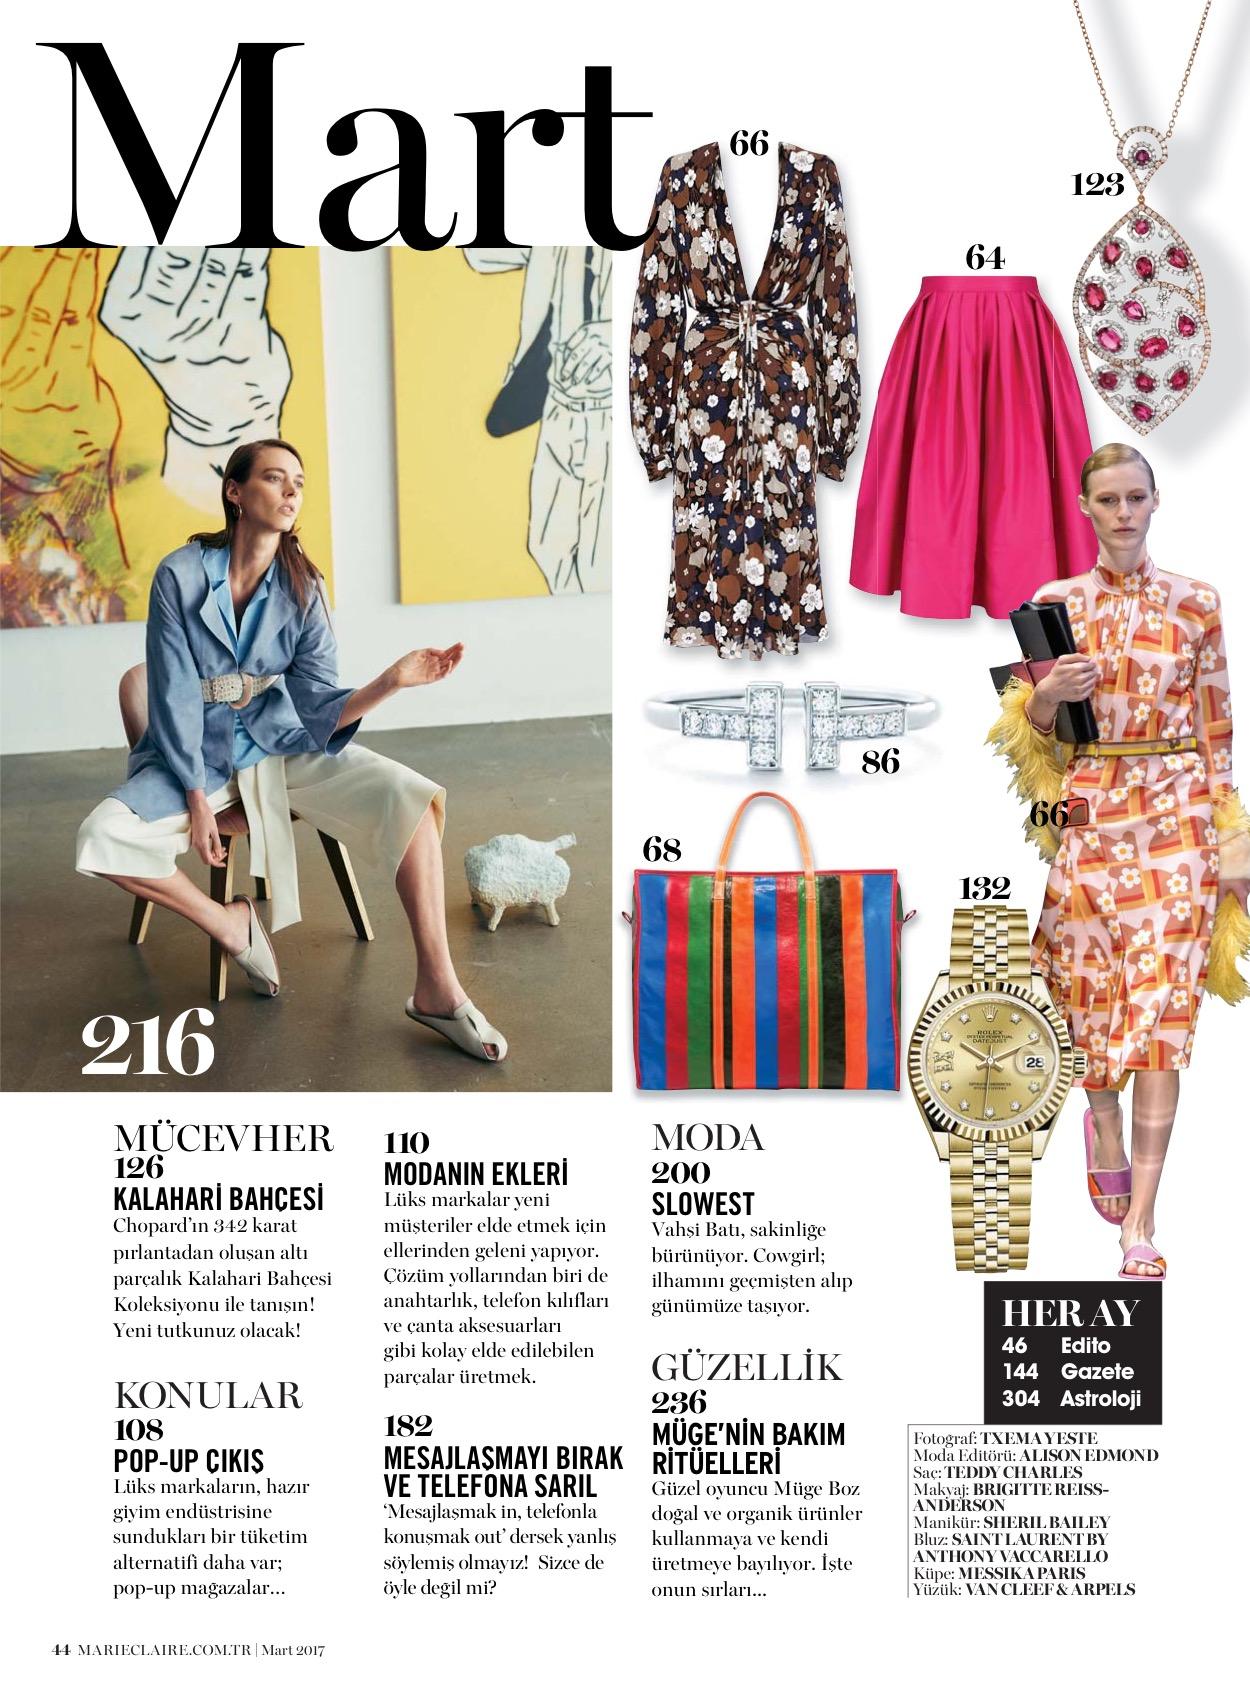 Marie Claire Mart 2017 Sayfa 3 bc42d8987f